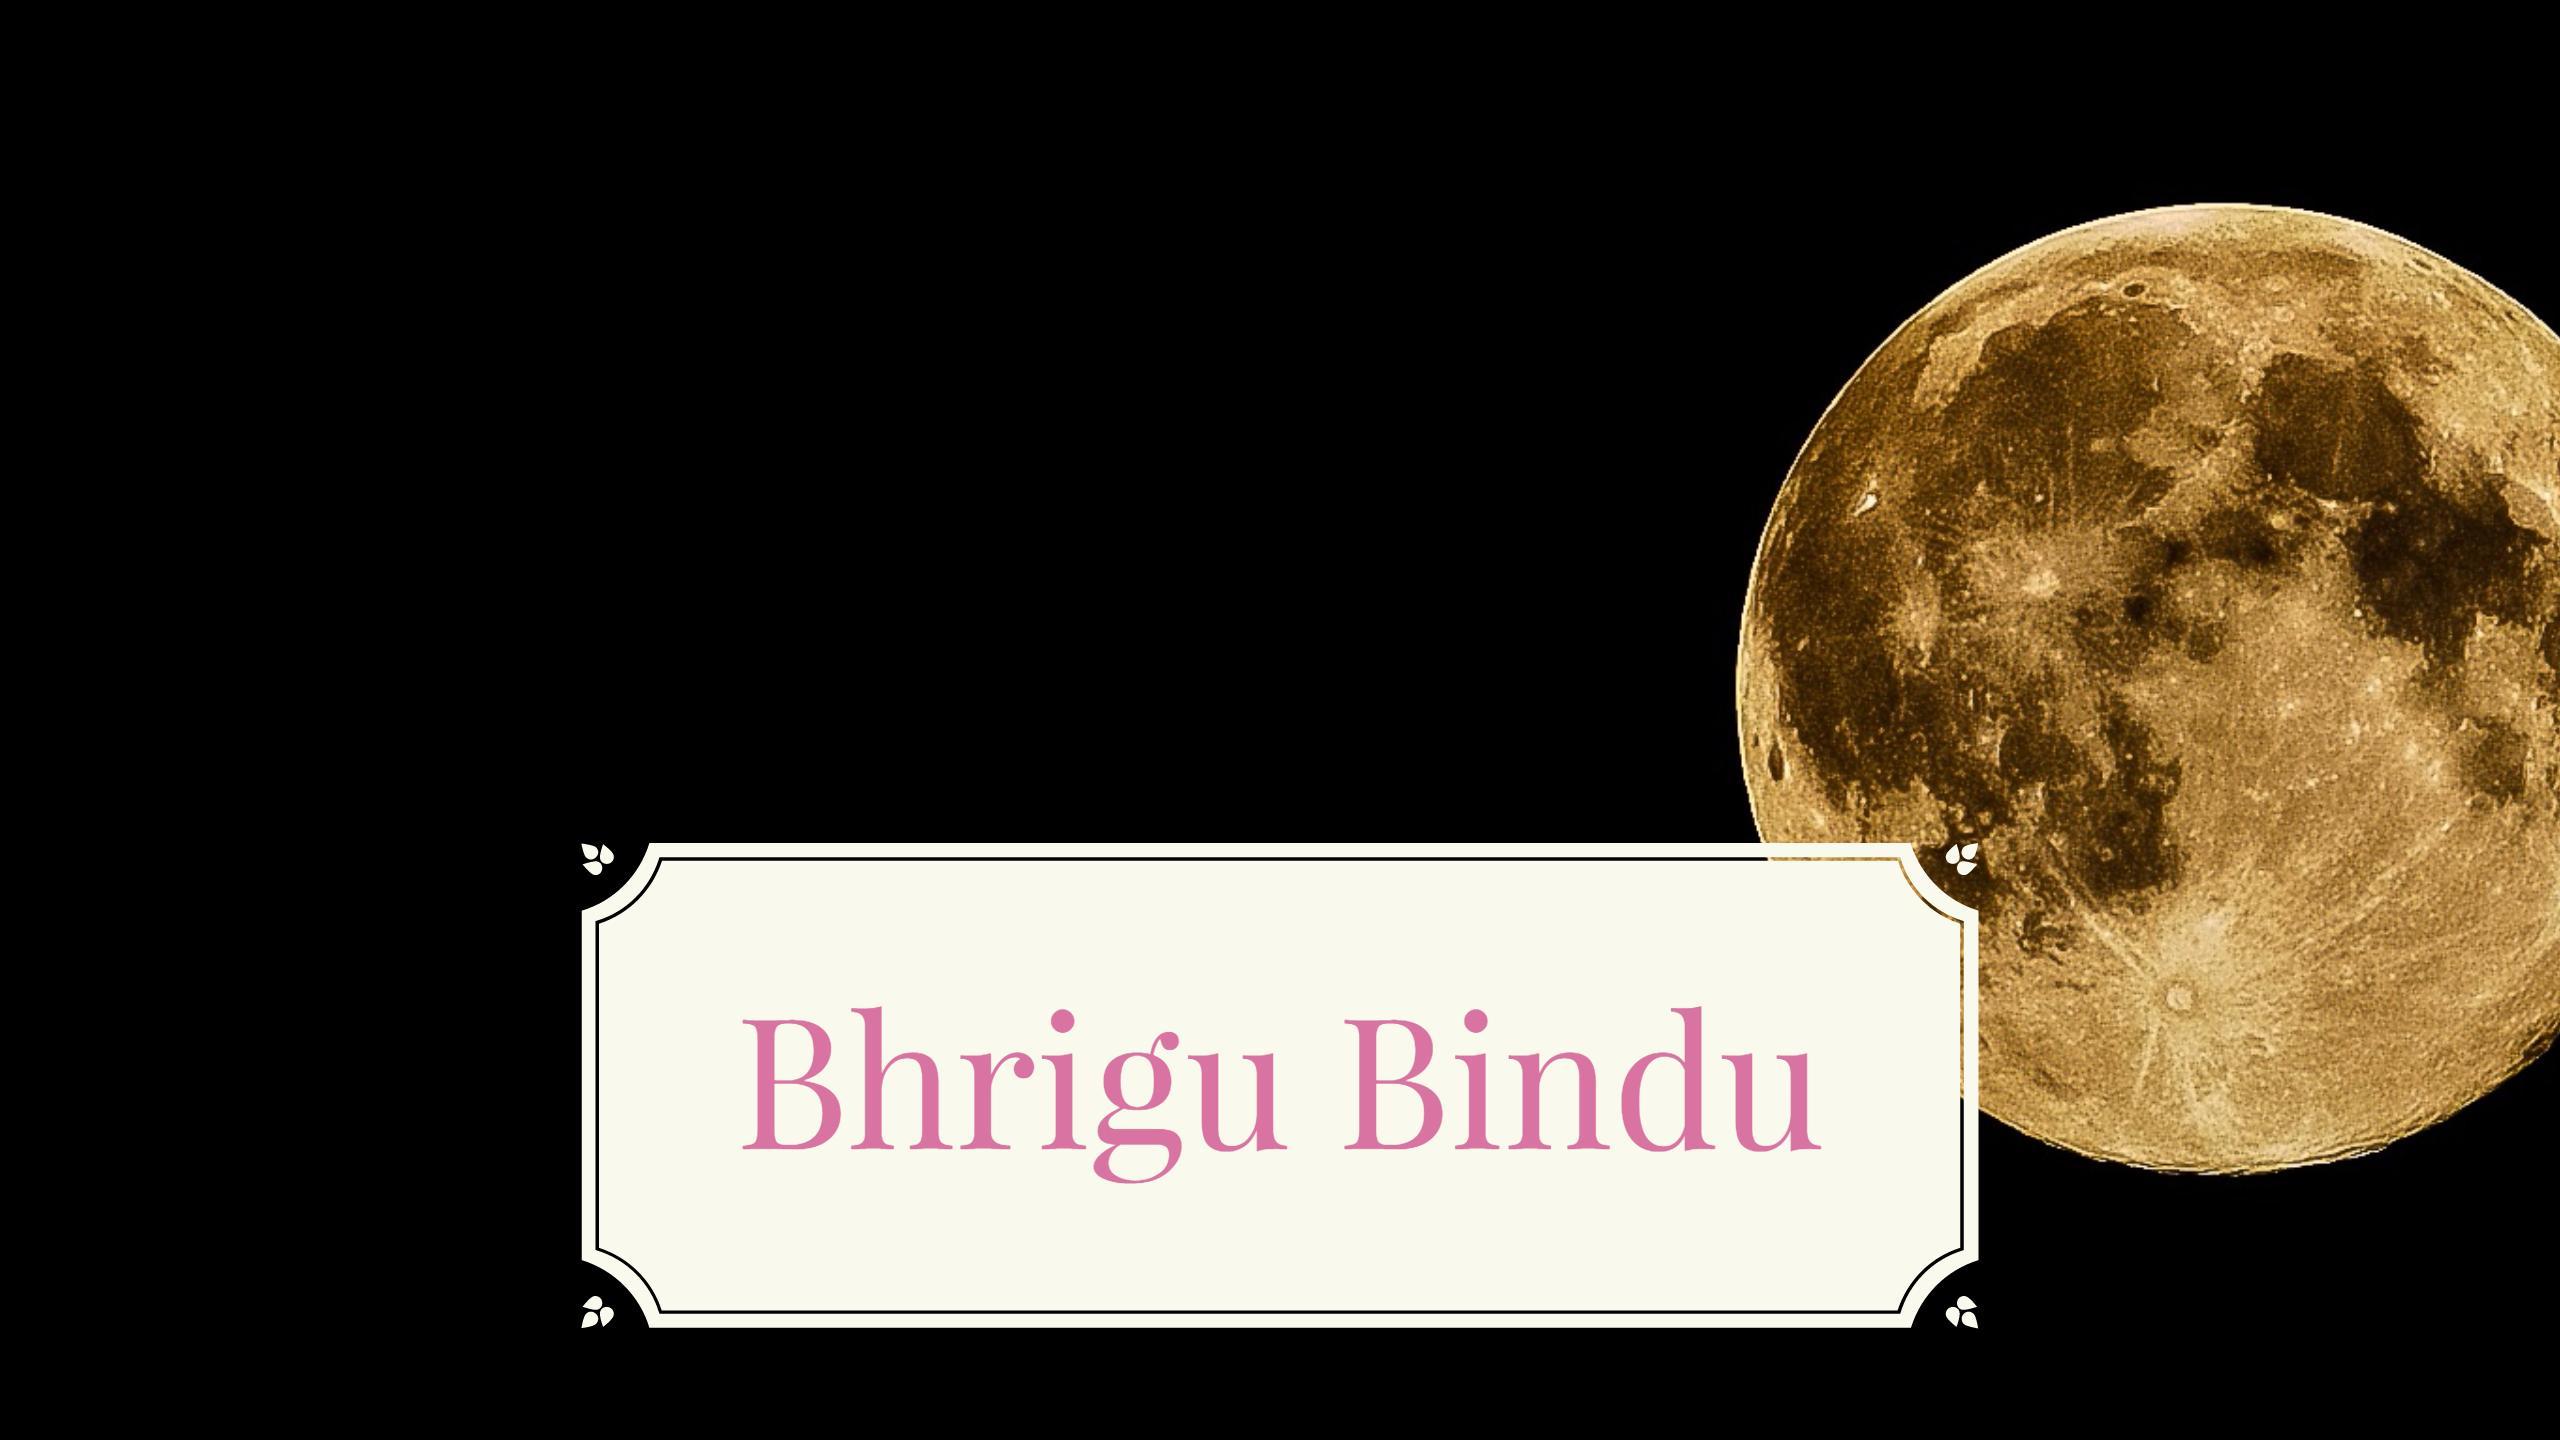 Bhrigu Bindu